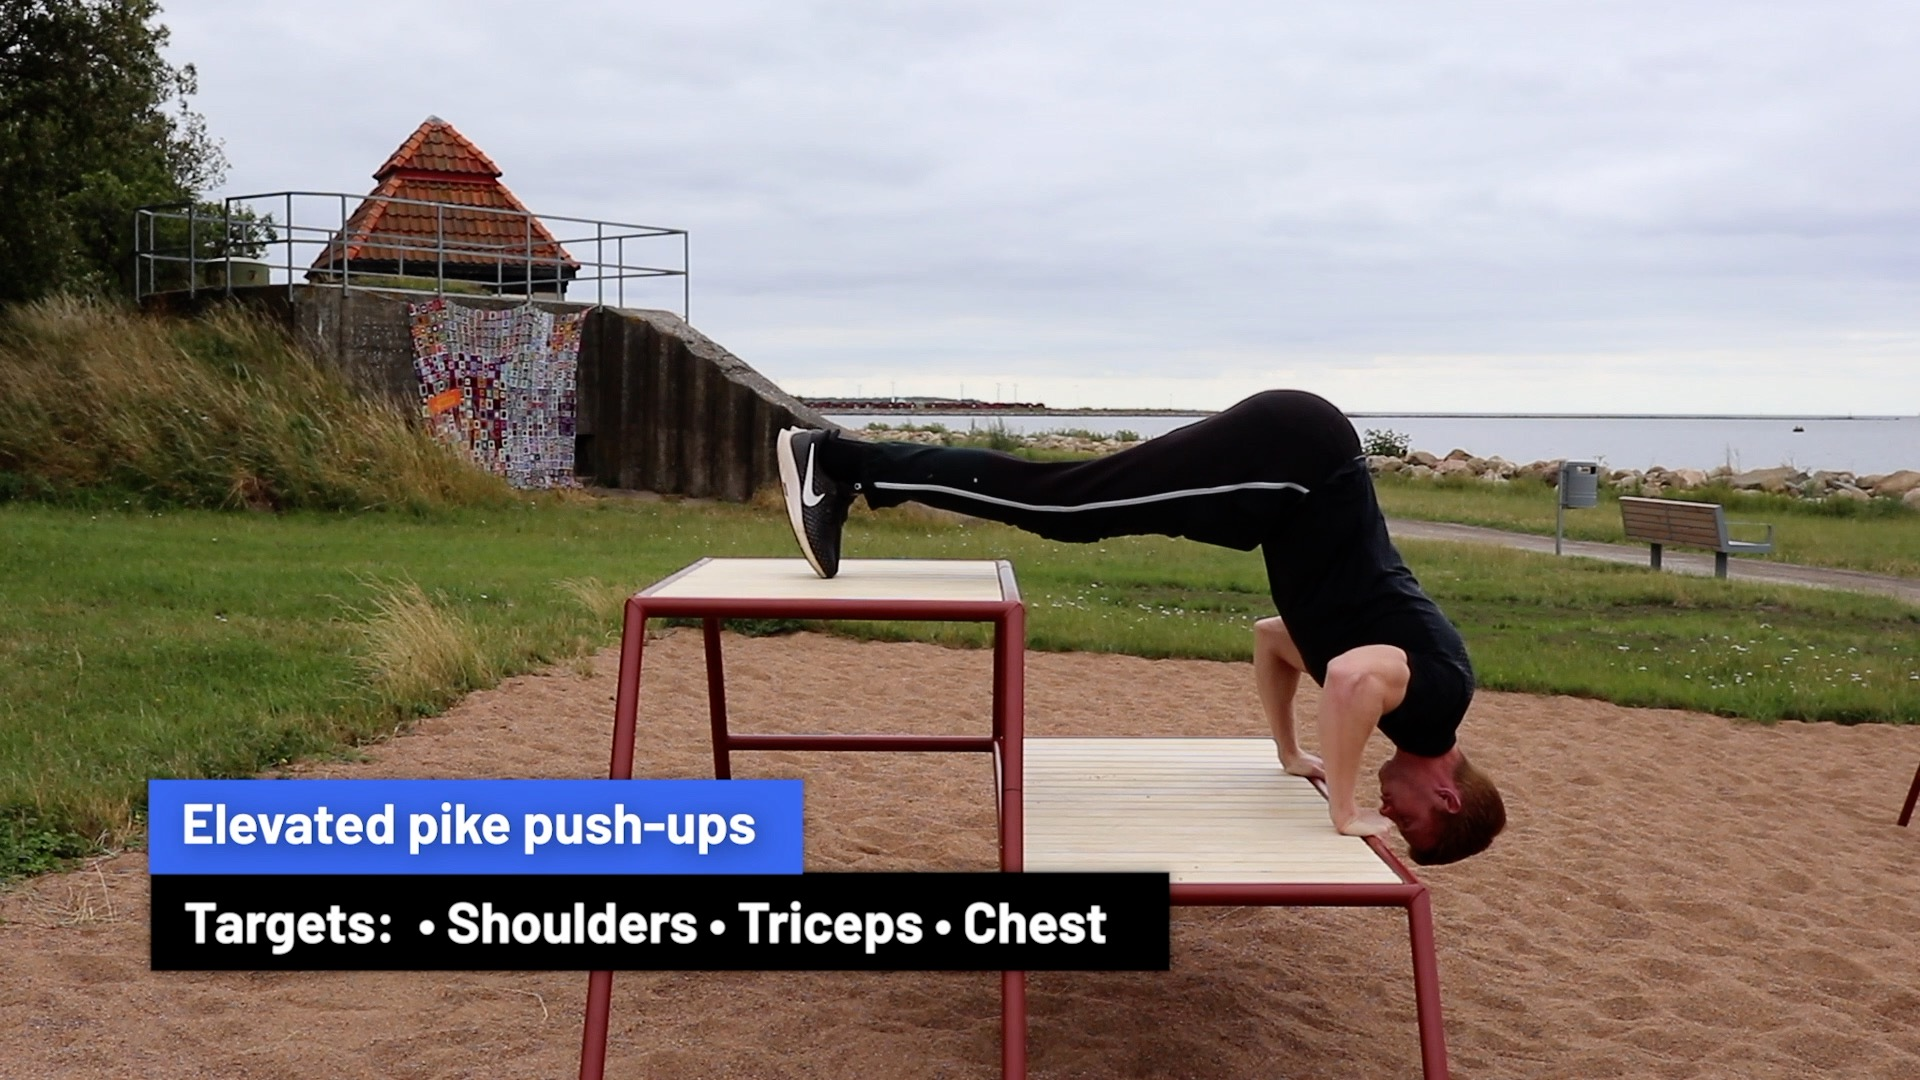 Elevated pike push-ups